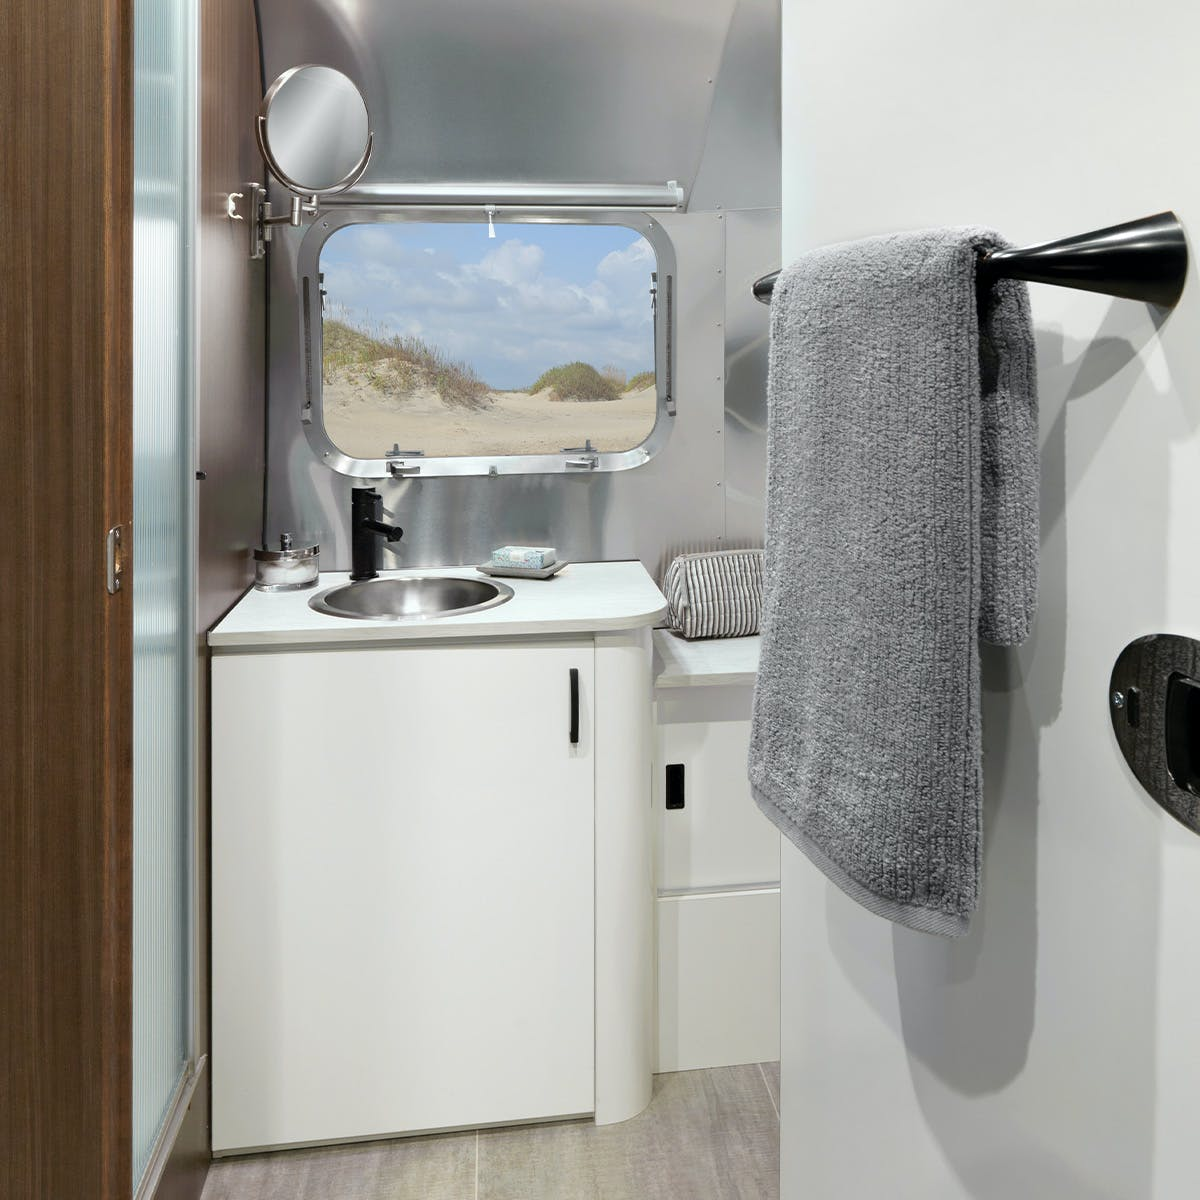 Caravel 22FB Bathroom